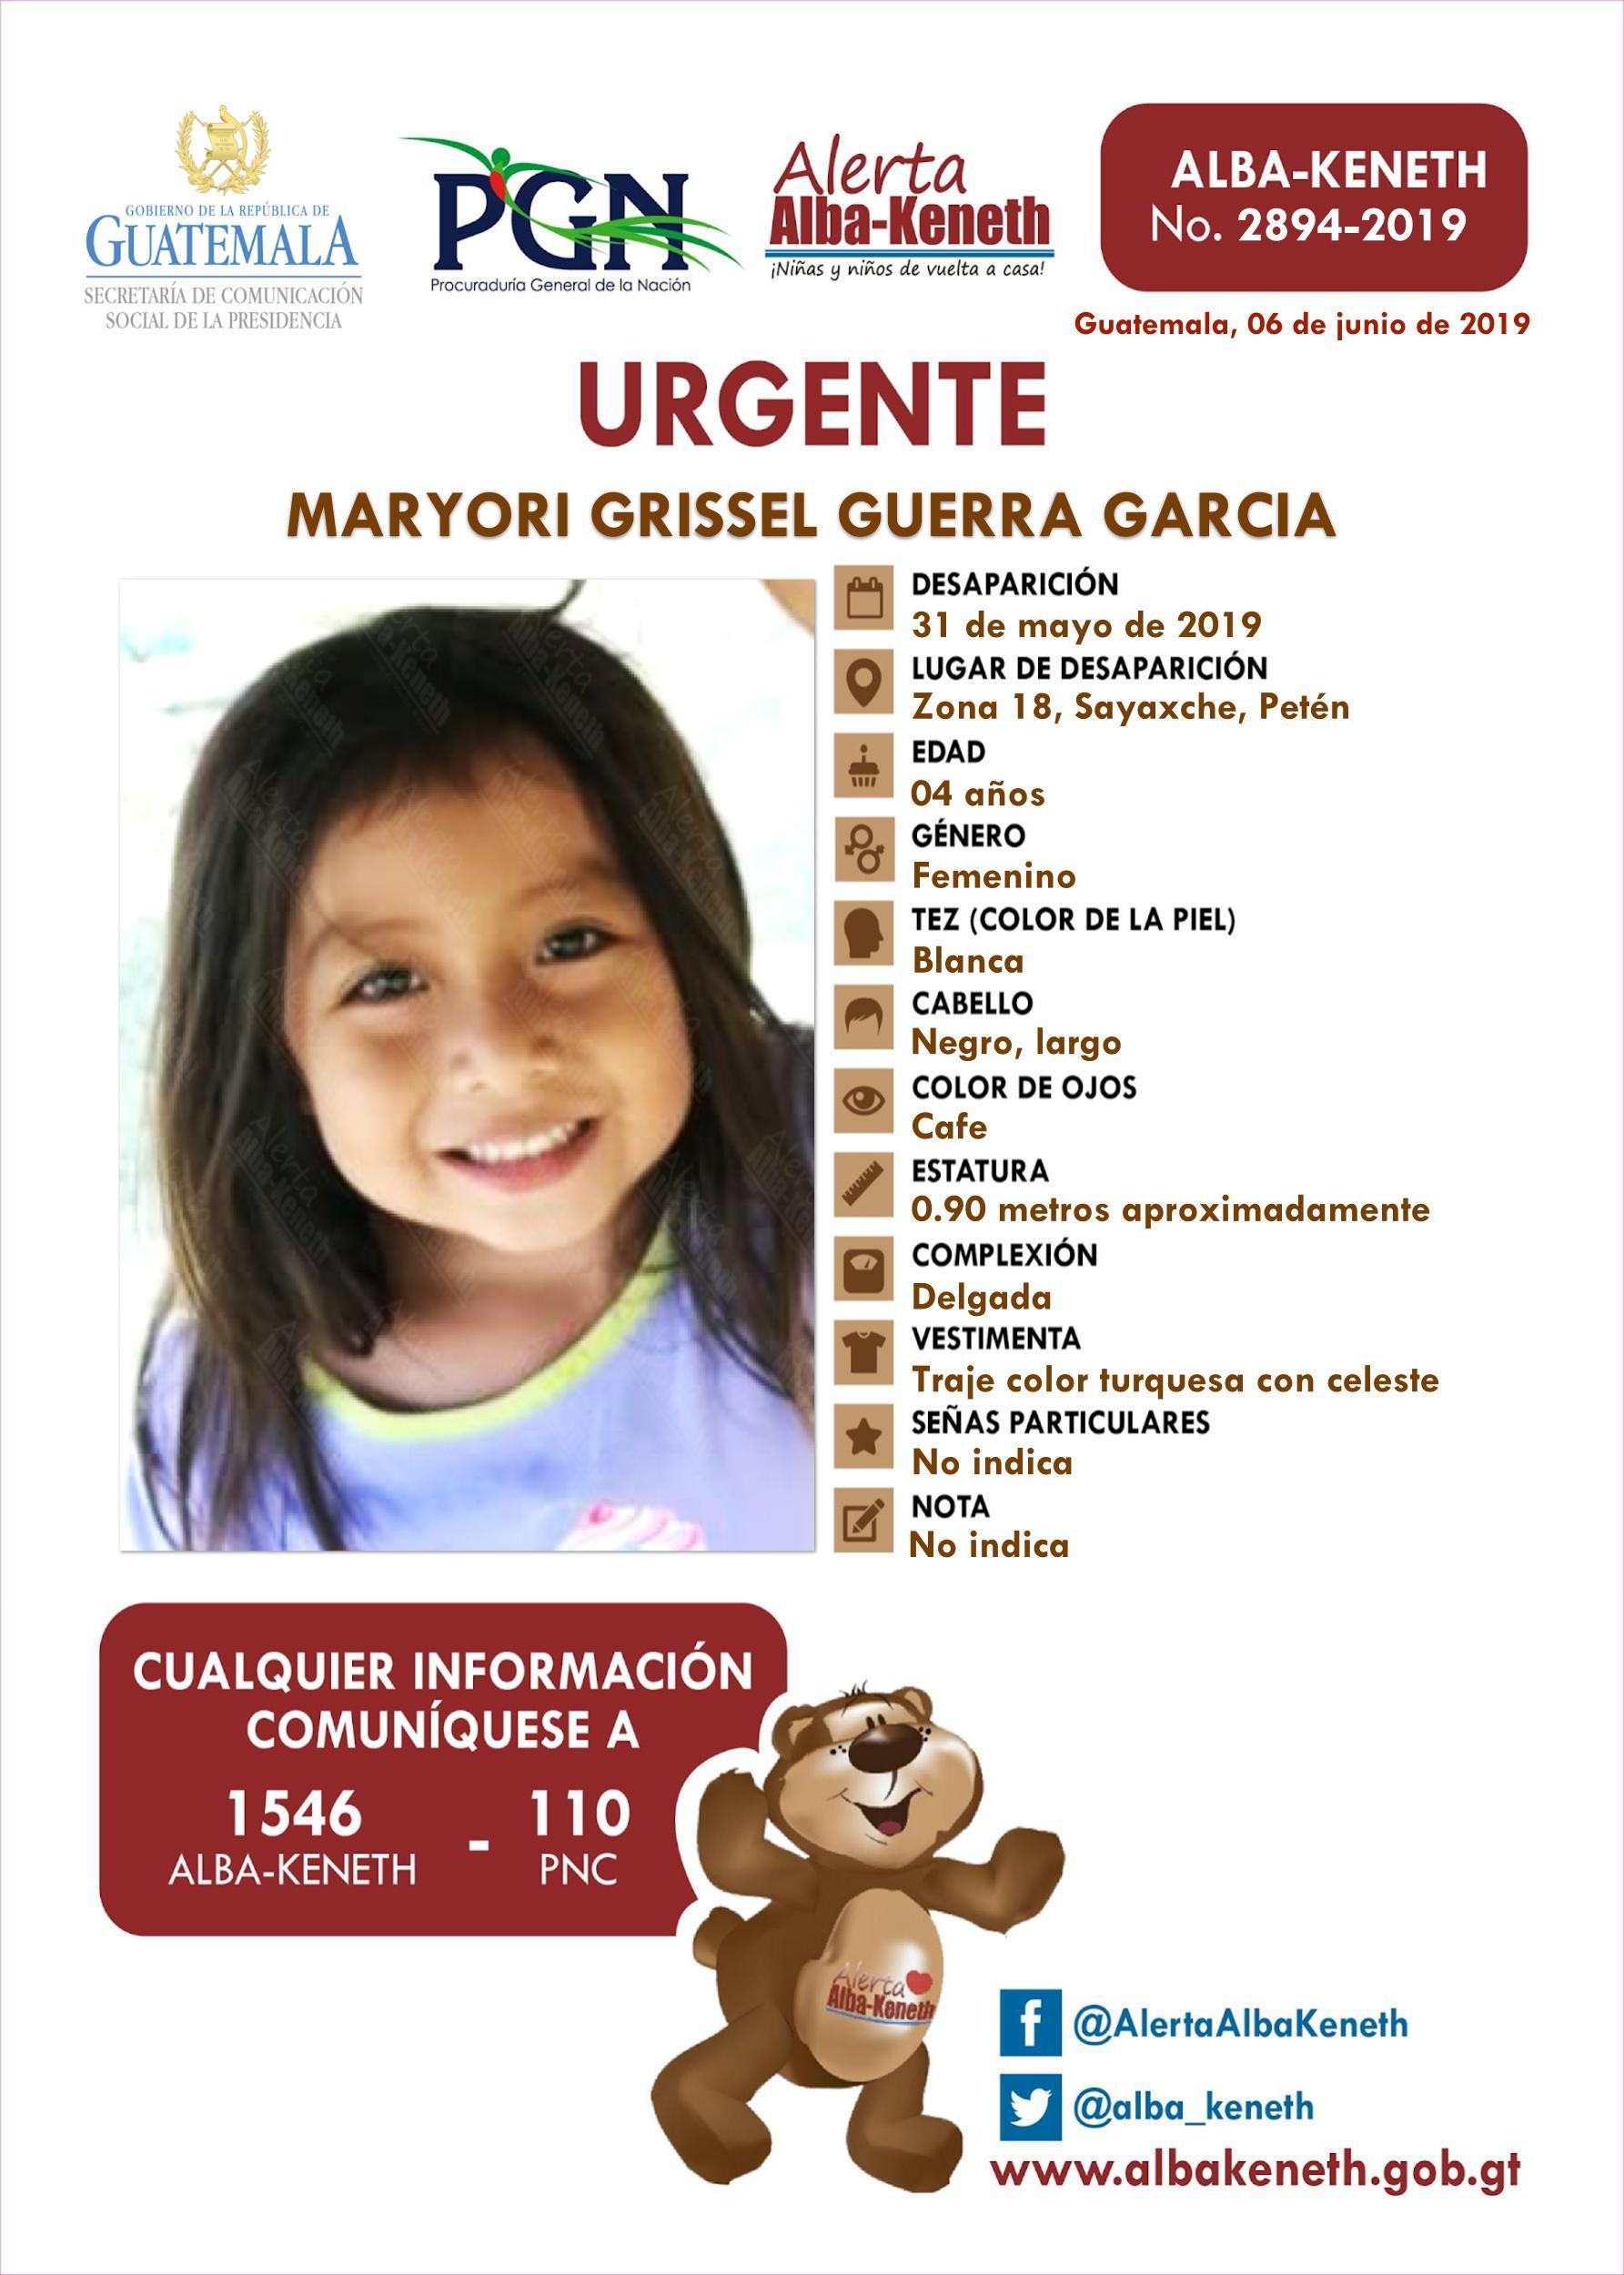 Maryori Grissel Guerra Garcia